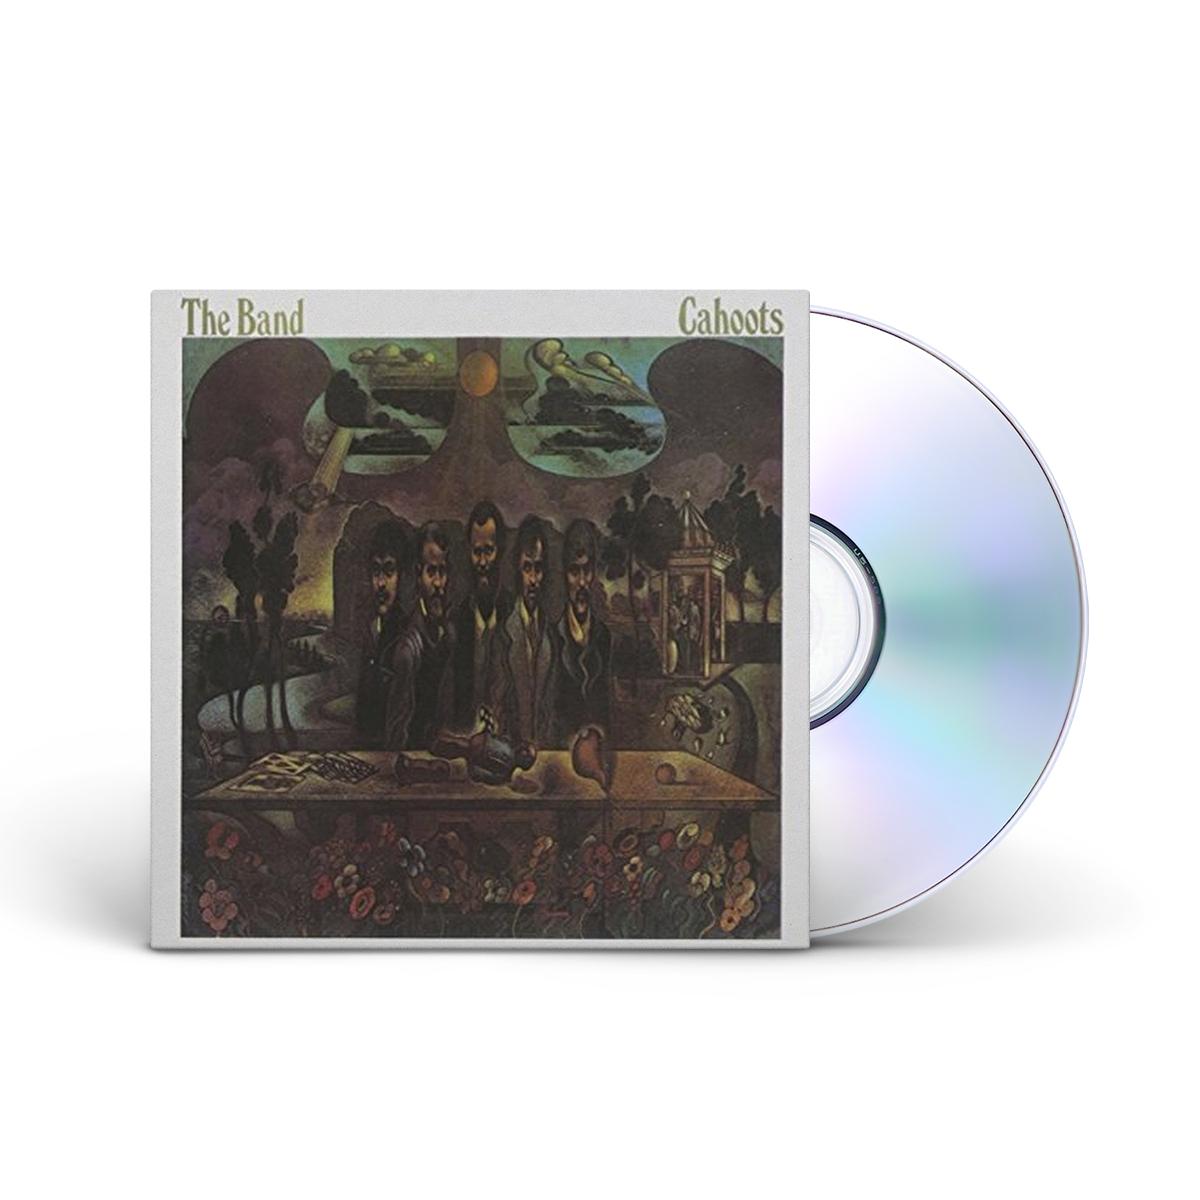 The Band Cahoots CD